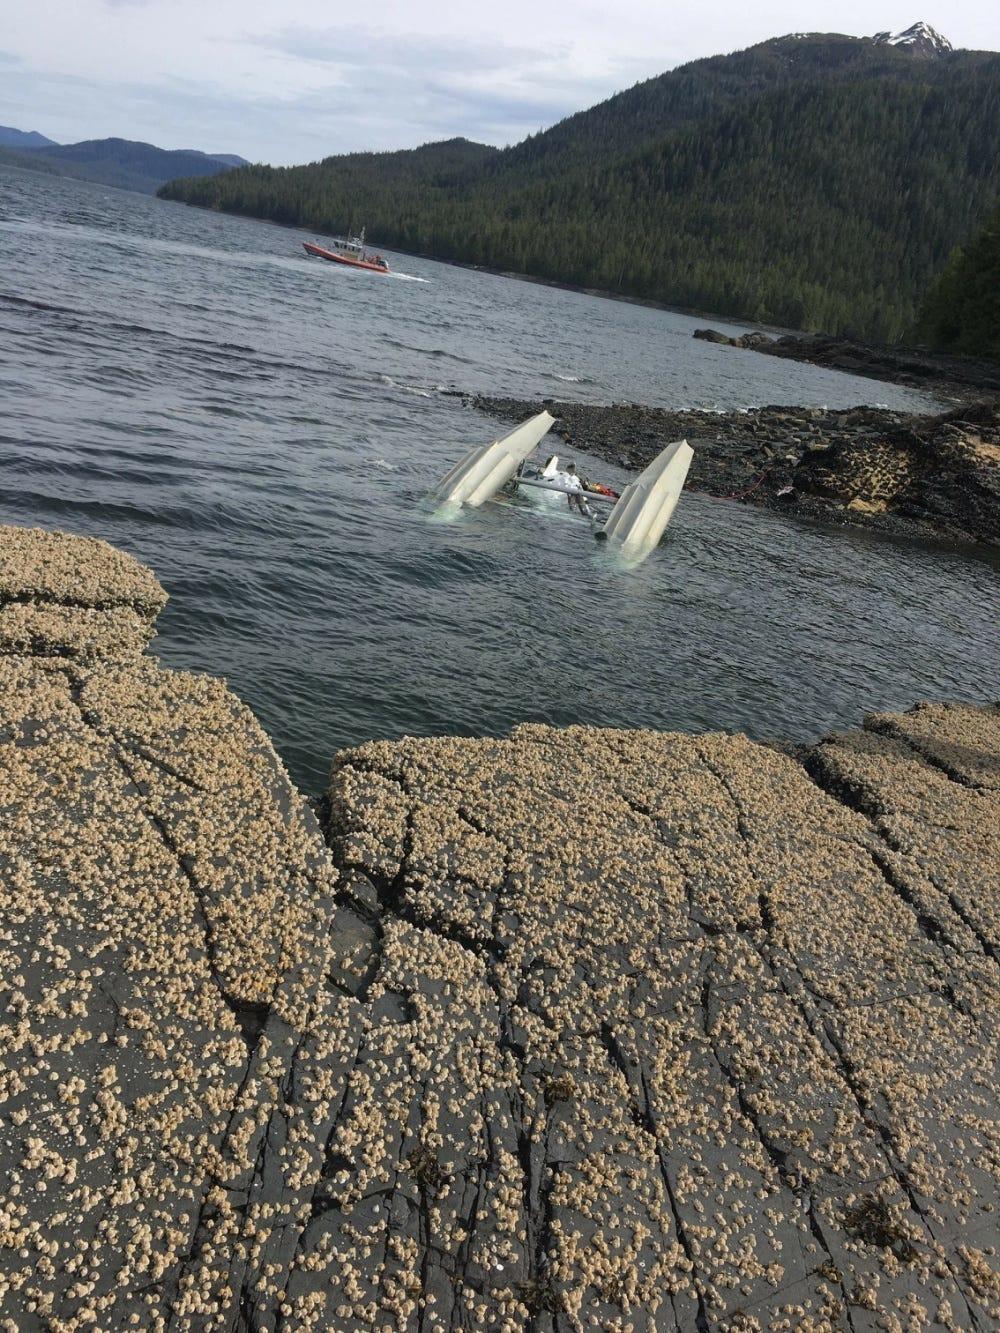 How did it happen? NTSB begins probe of midair collision of Alaska floatplanes that killed 6 people